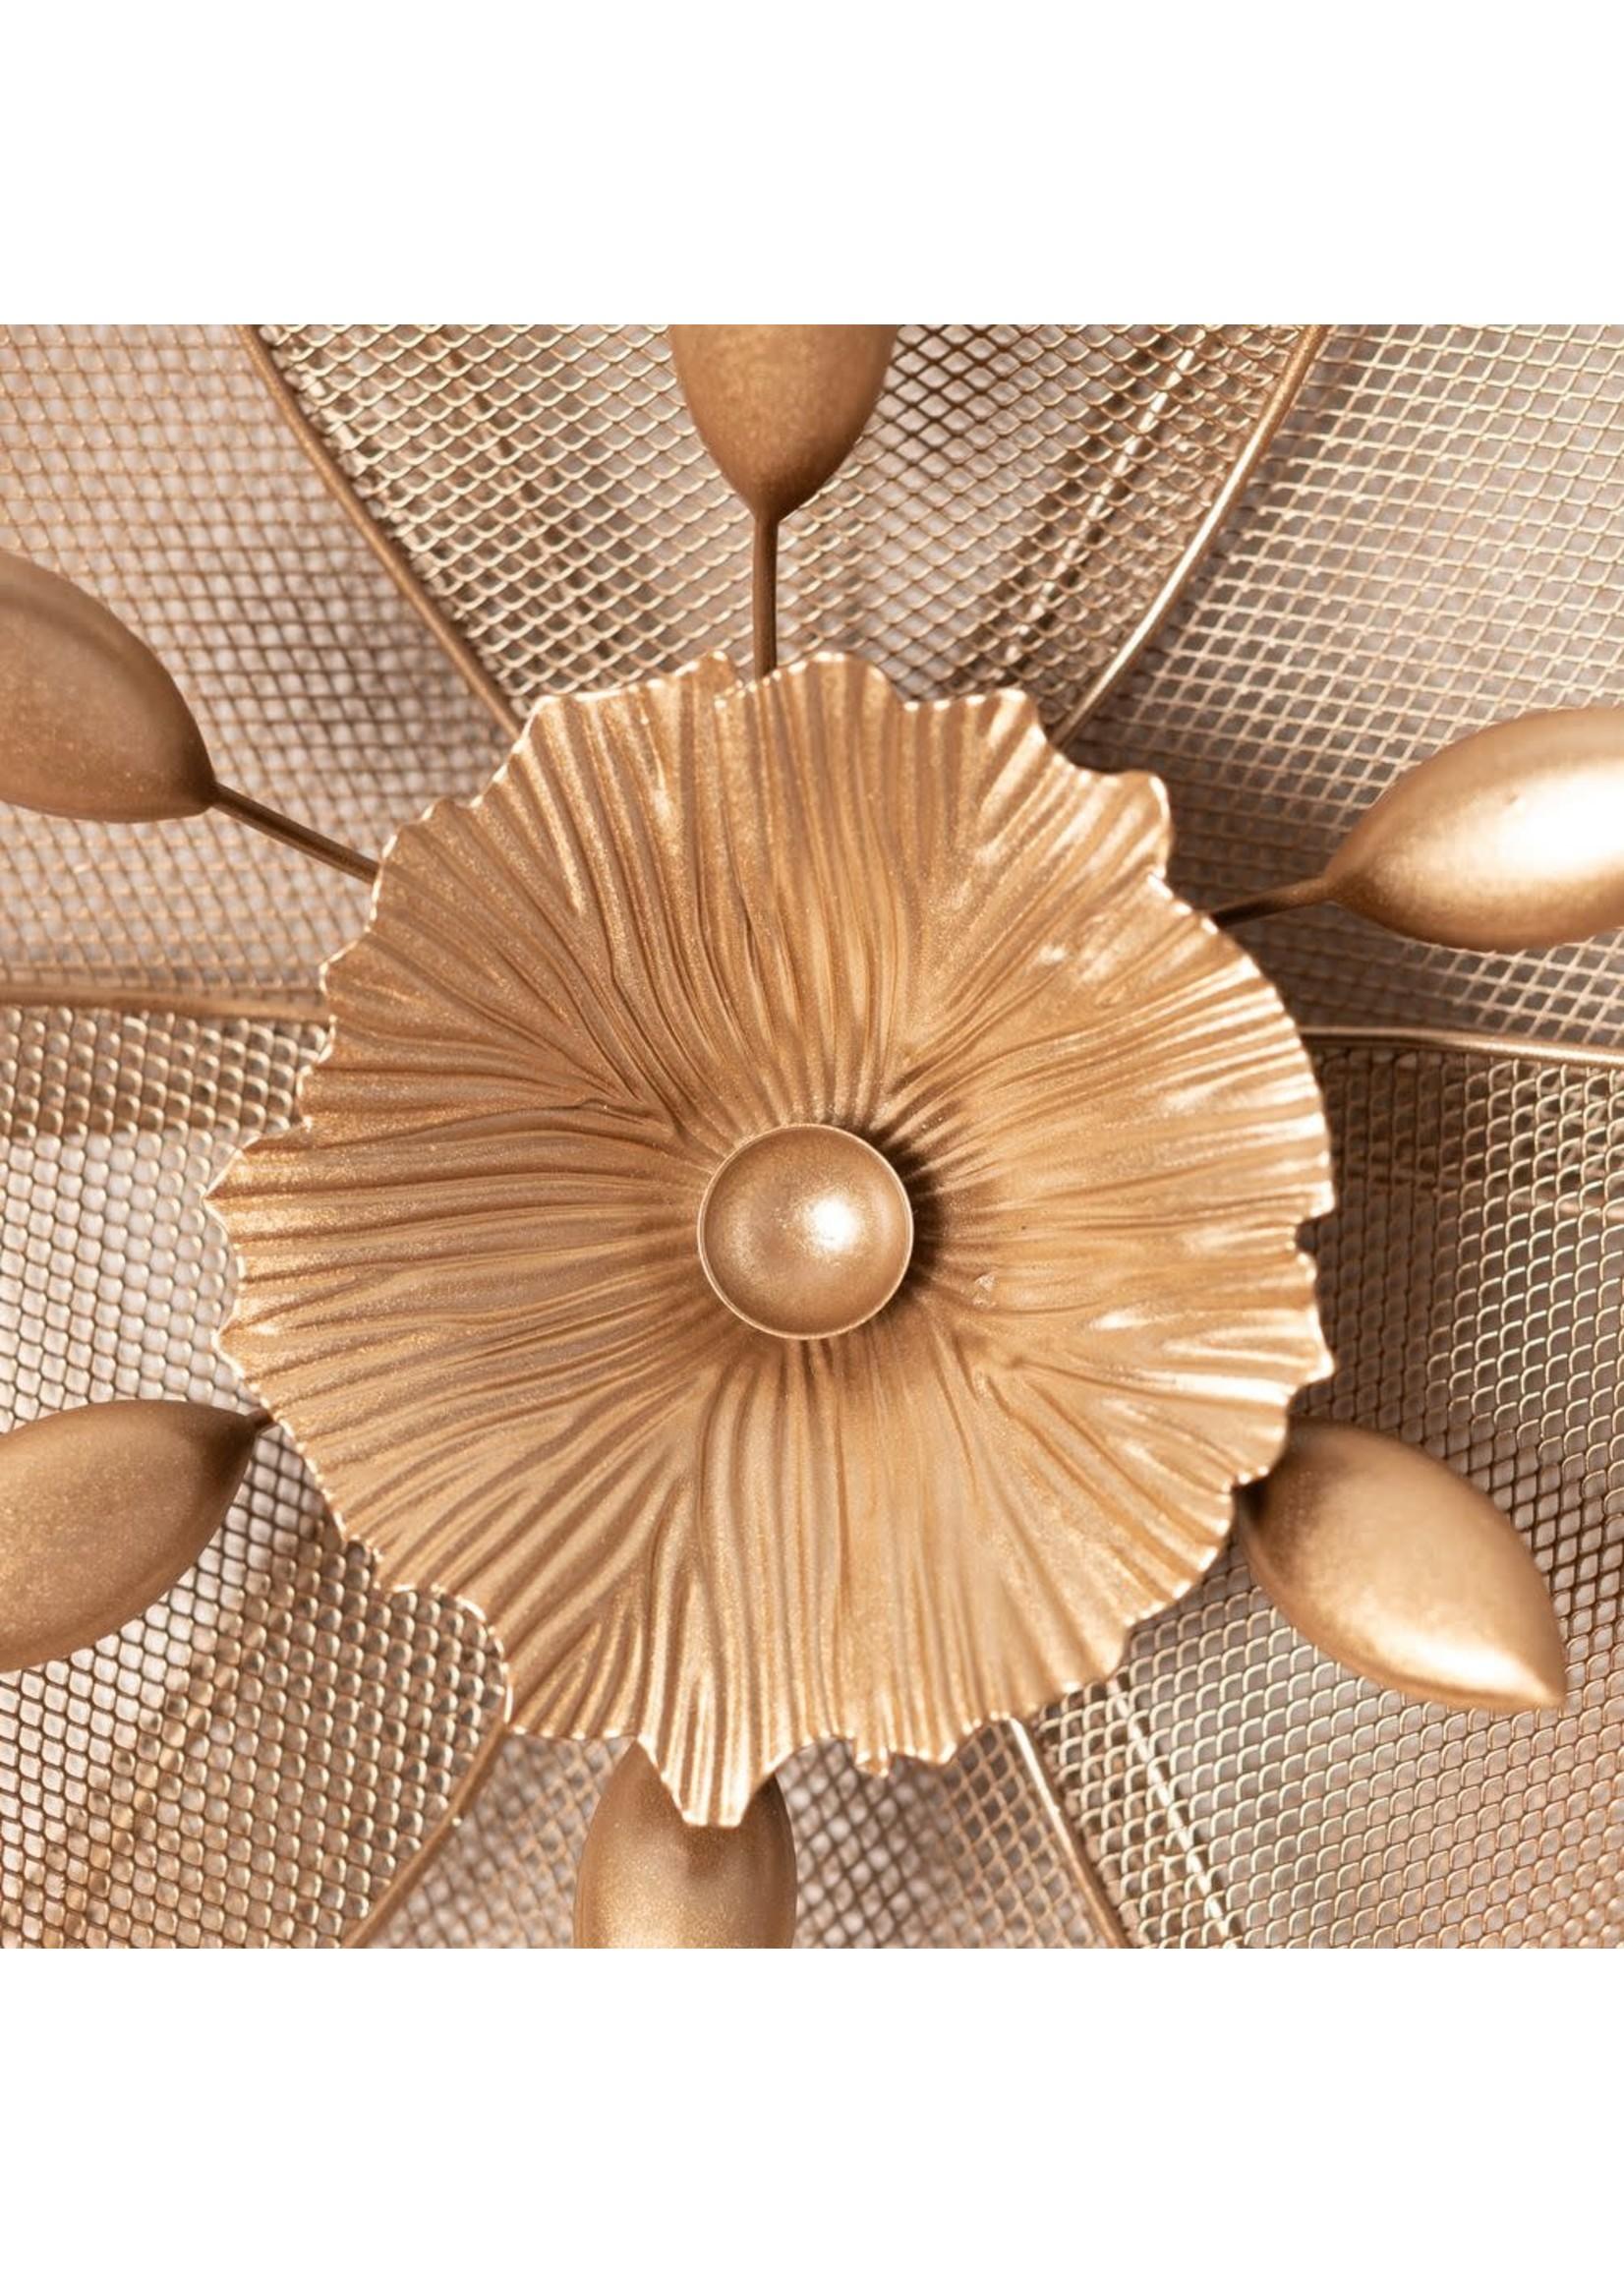 HESTIA REFINED GLAMOUR METAL FLOWER WALL ART GOLD 46CM